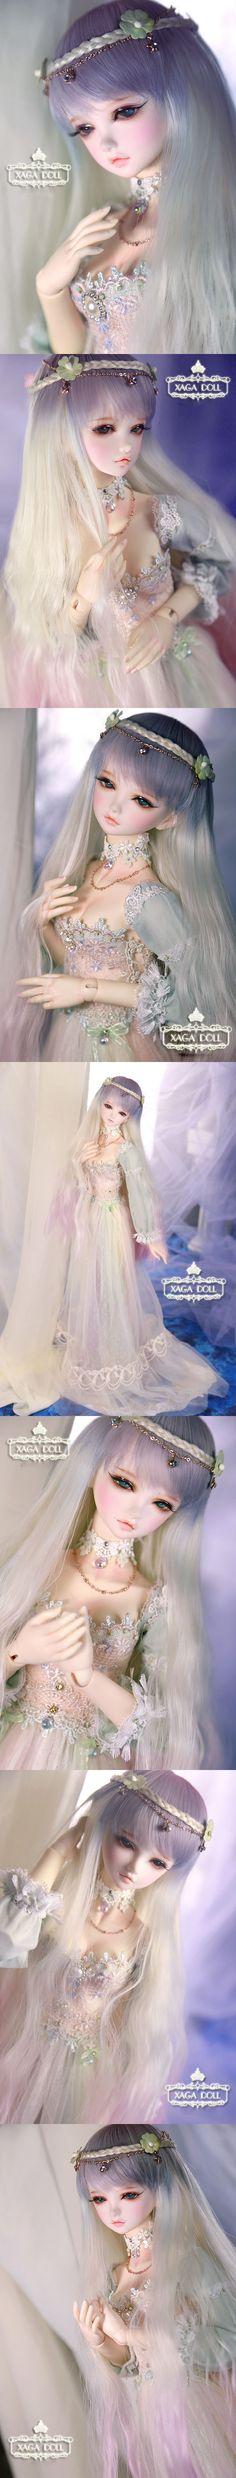 BJD July Girl 59cm Ball-Jointed Doll_Purple Black Obsidia_XAGA DOLL_DOLL_Ball Jointed Dolls (BJD) company-Legenddoll